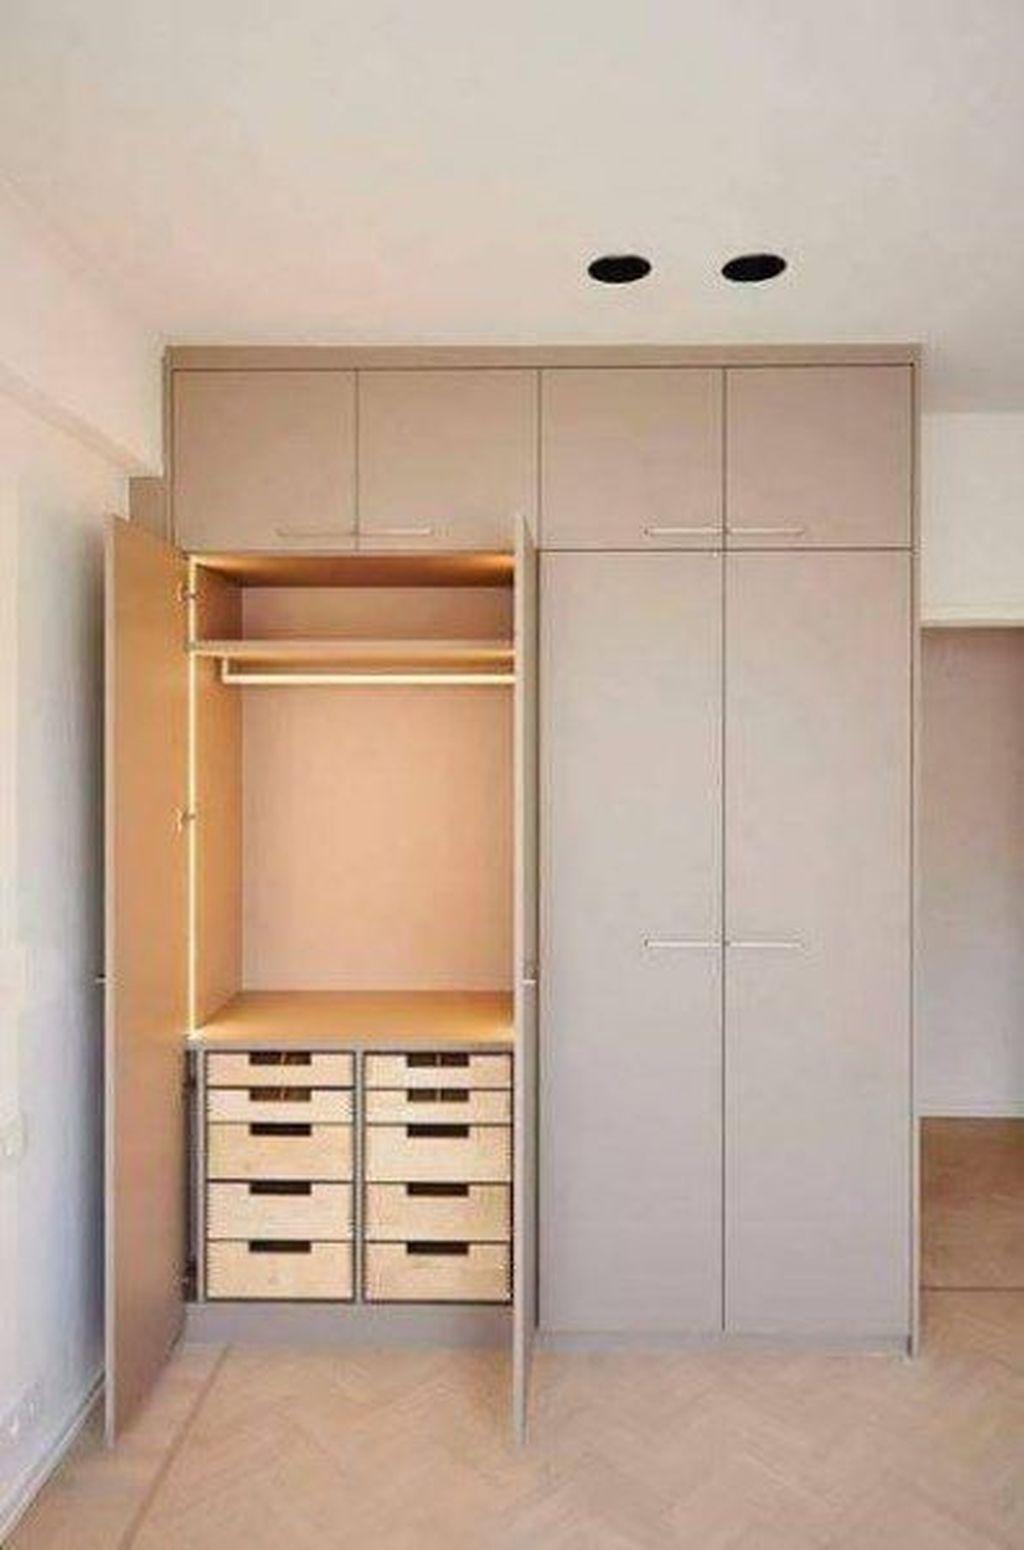 20 Elegant Wardrobe Design Ideas For Your Small Bedroom Cupboard Design Bedroom Closet Design Bedroom Cupboard Designs